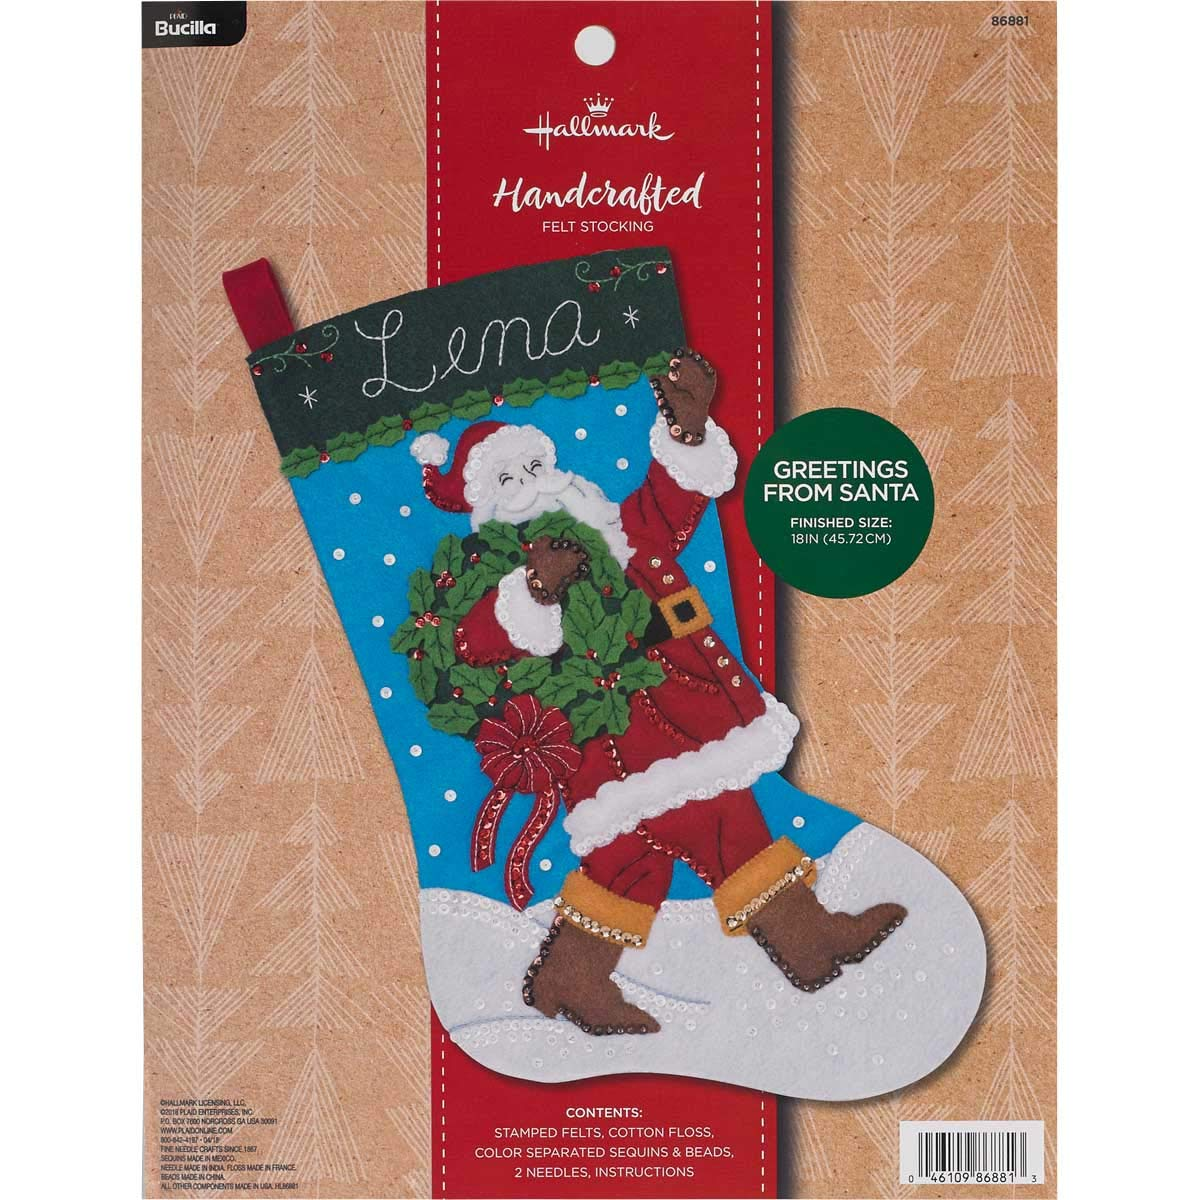 "Bucilla 86881 Hallmark Felt Stocking Kit, 18"", Greetings From Santa"